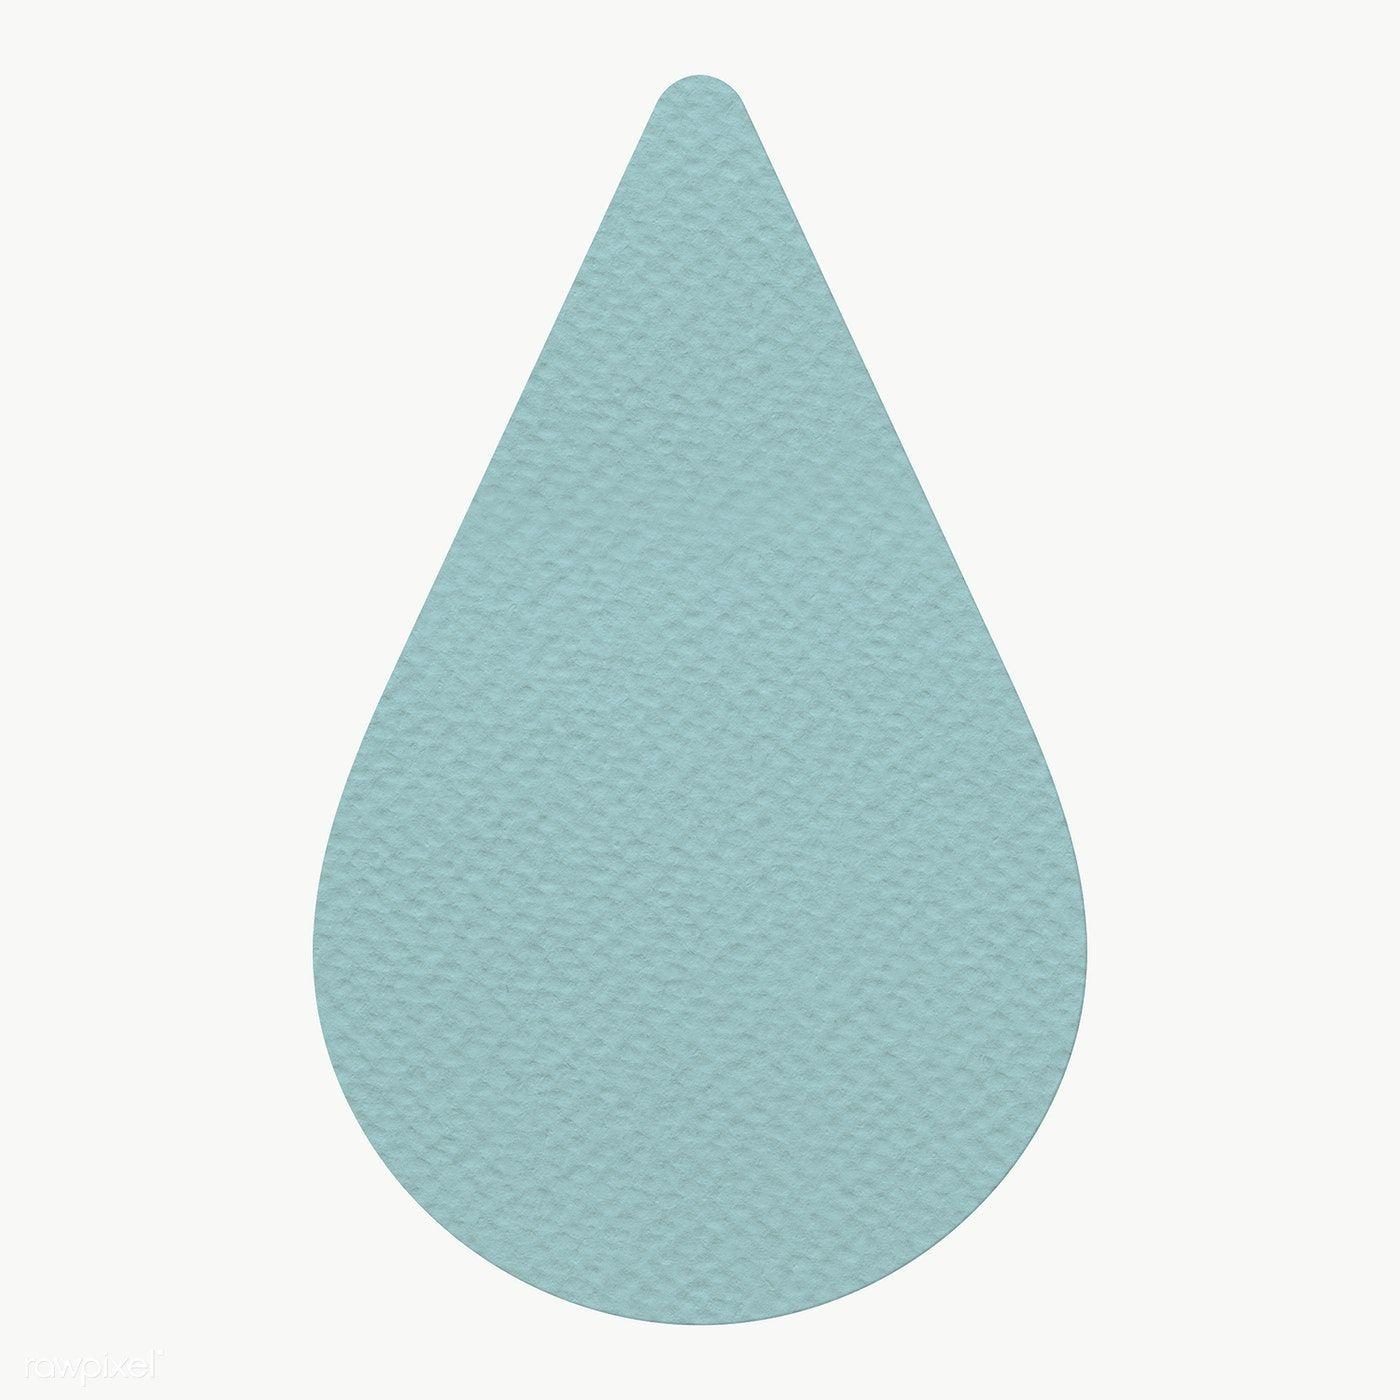 Blue Textured Paper Water Drop Sticker Design Element Free Image By Rawpixel Com Sasi Sticker Design Paper Texture Free Design Resources